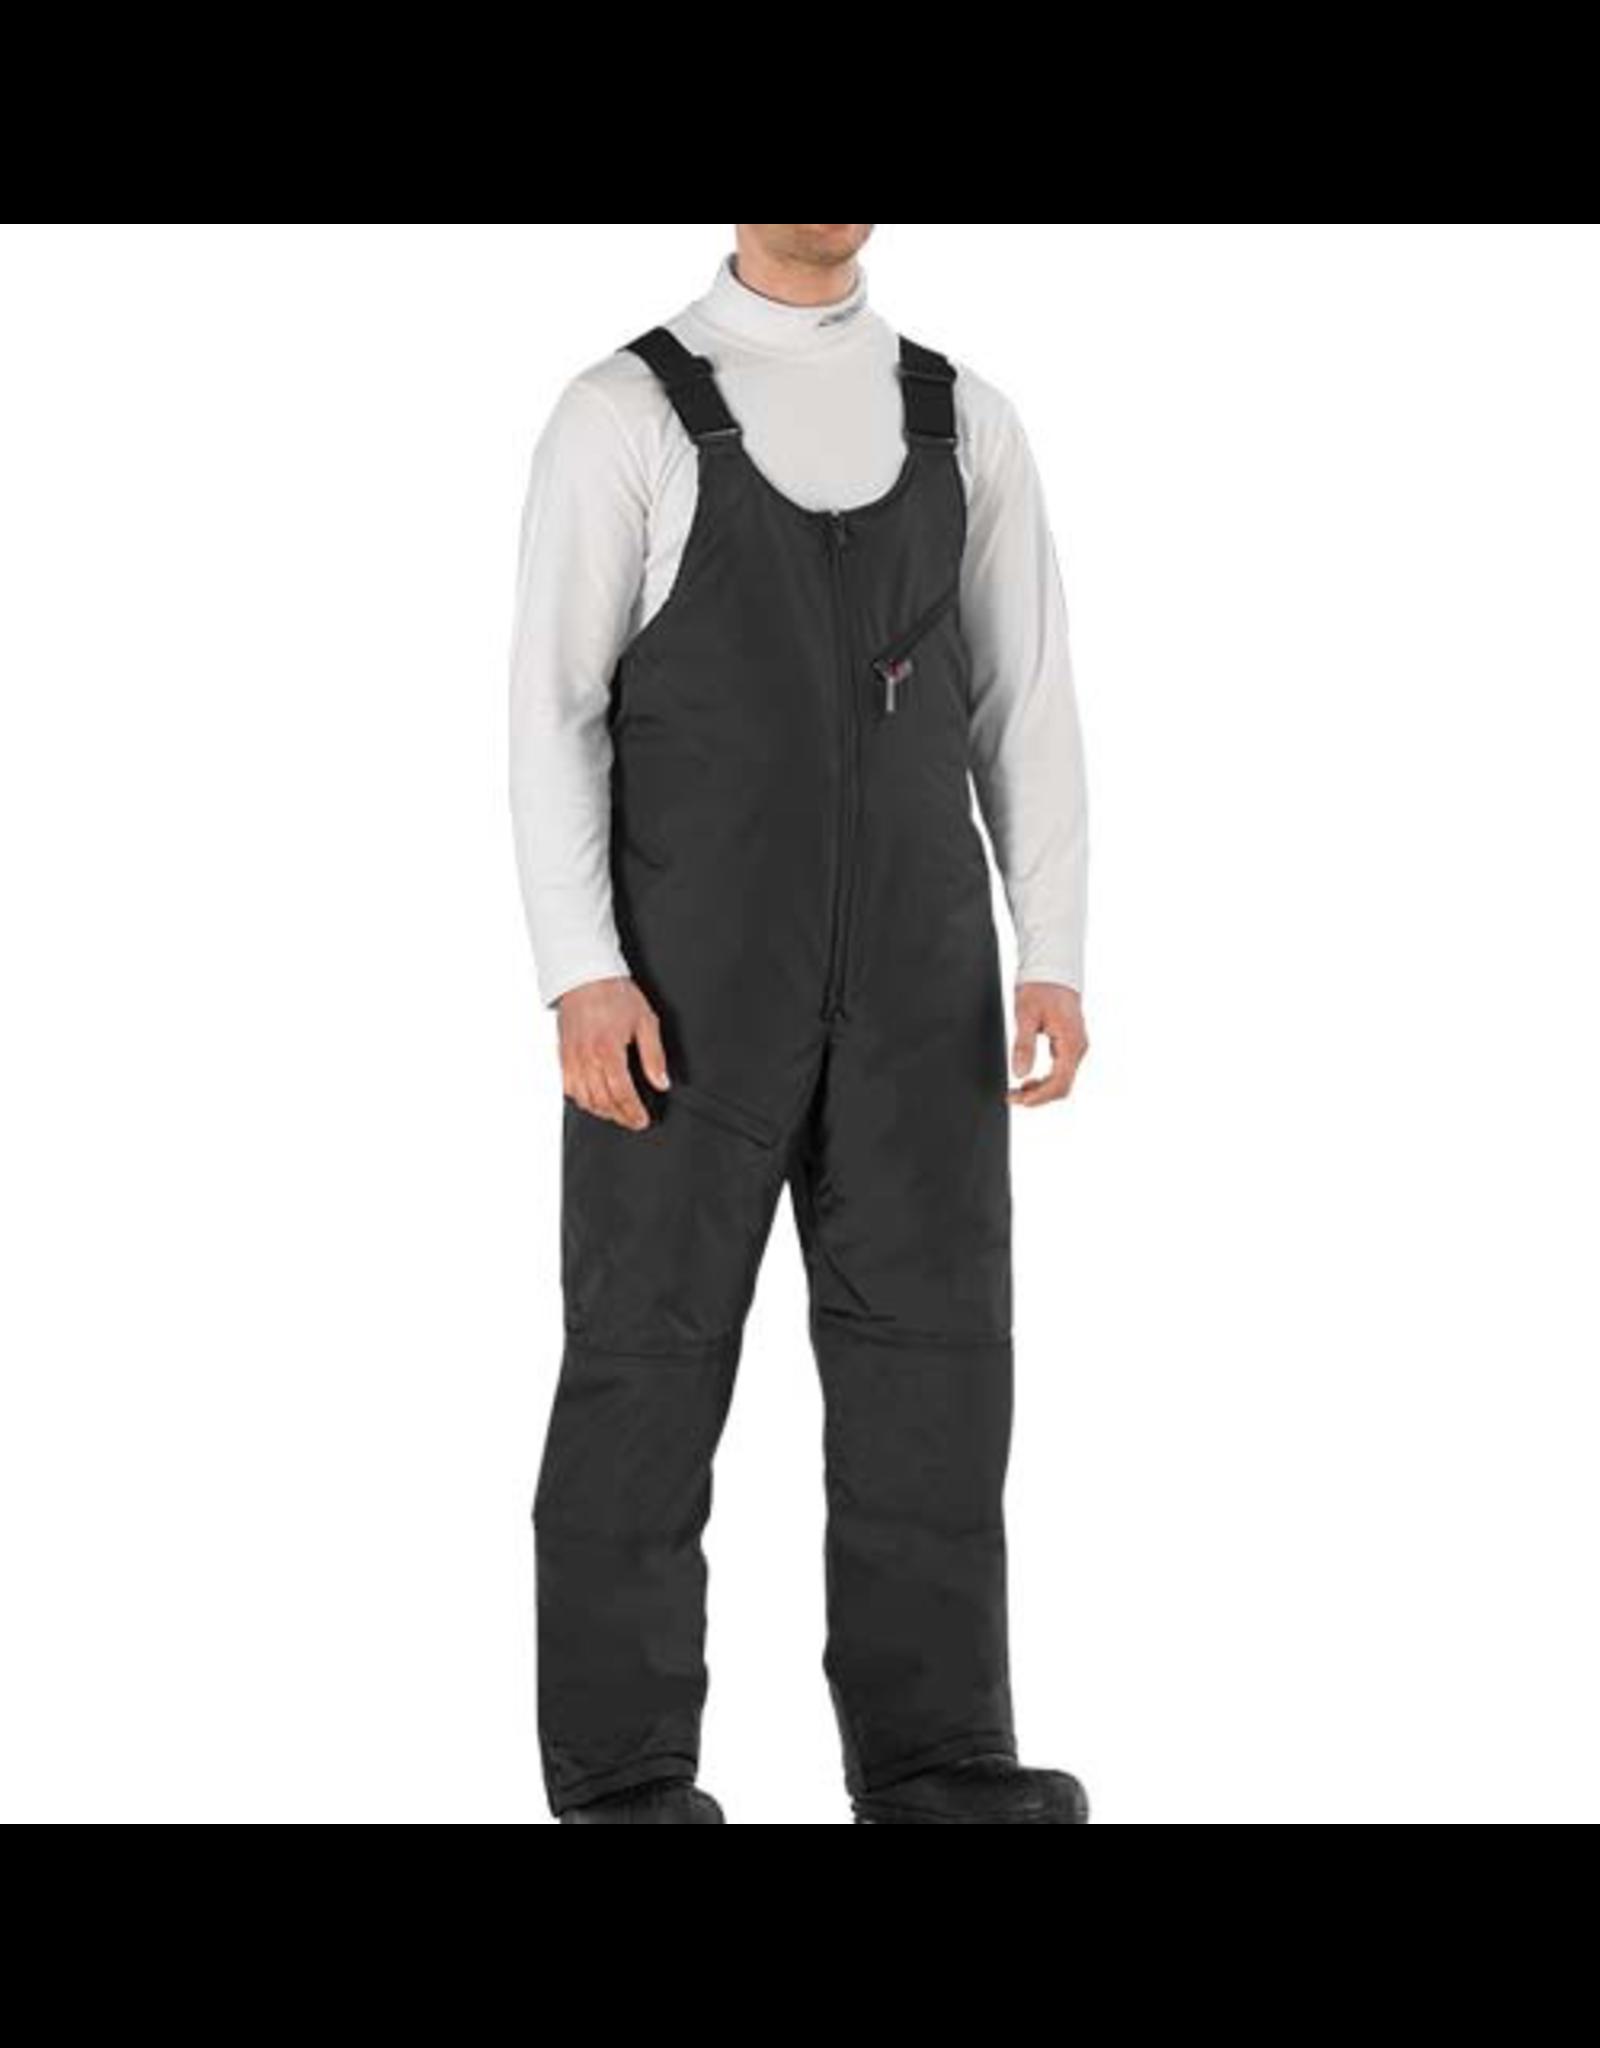 Choko Choko Core Men's Nylon 2Pc Suit